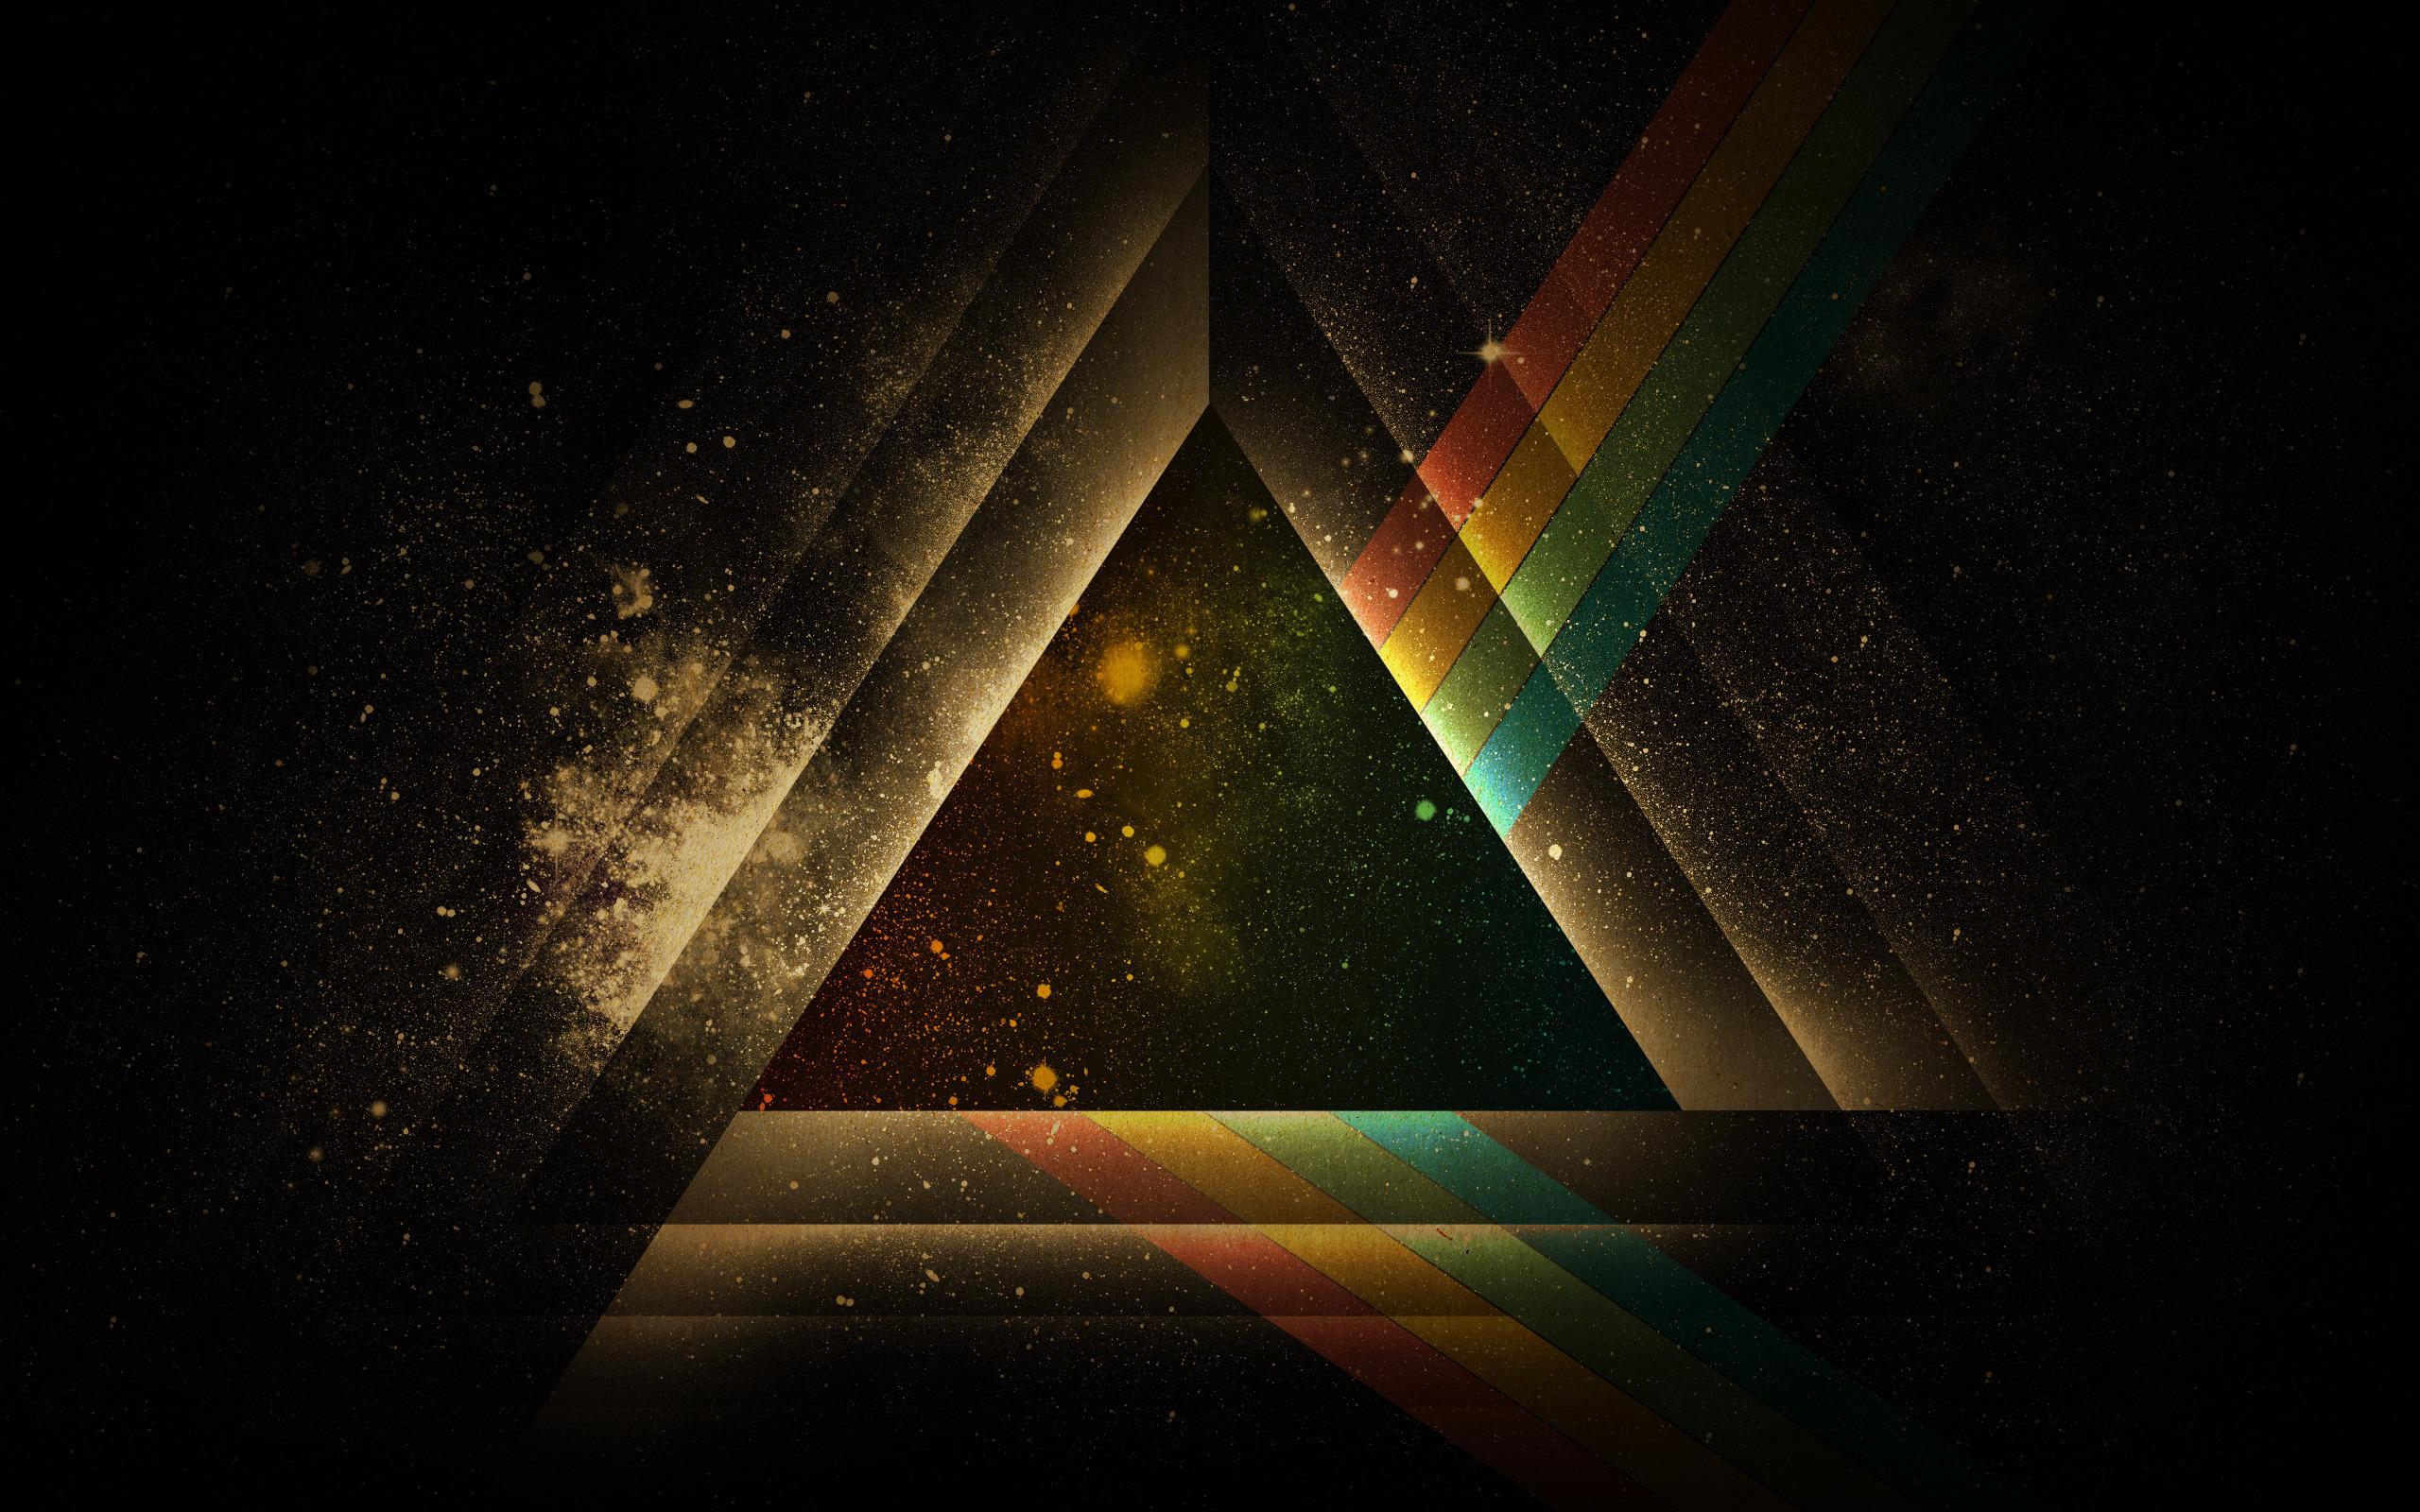 Pink Floyd Wallpaper Hd 23802 2560x1600px